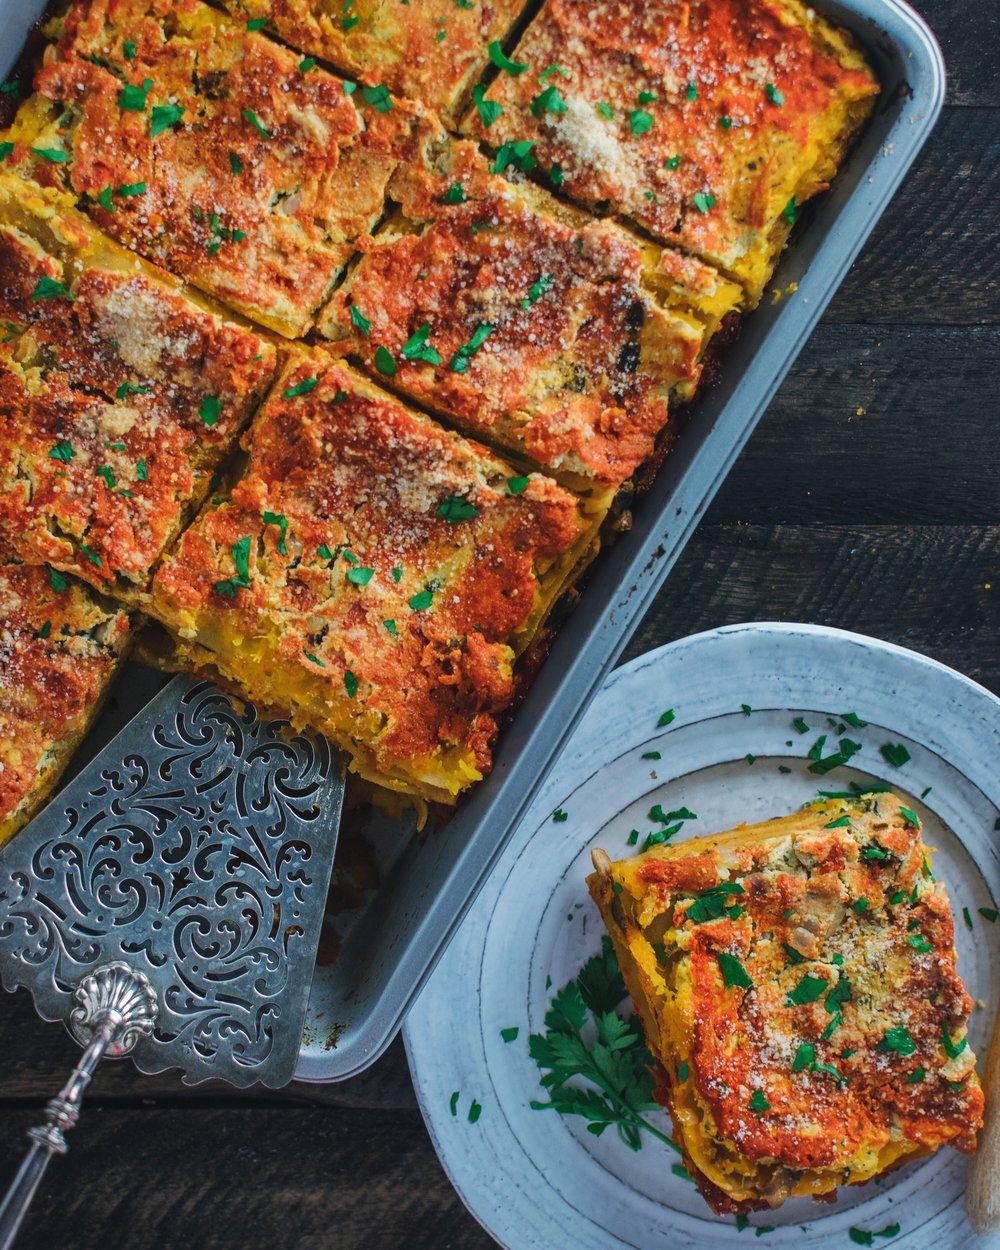 Mushroom & Butternut Squash Lasagna with Tofu Ricotta - V